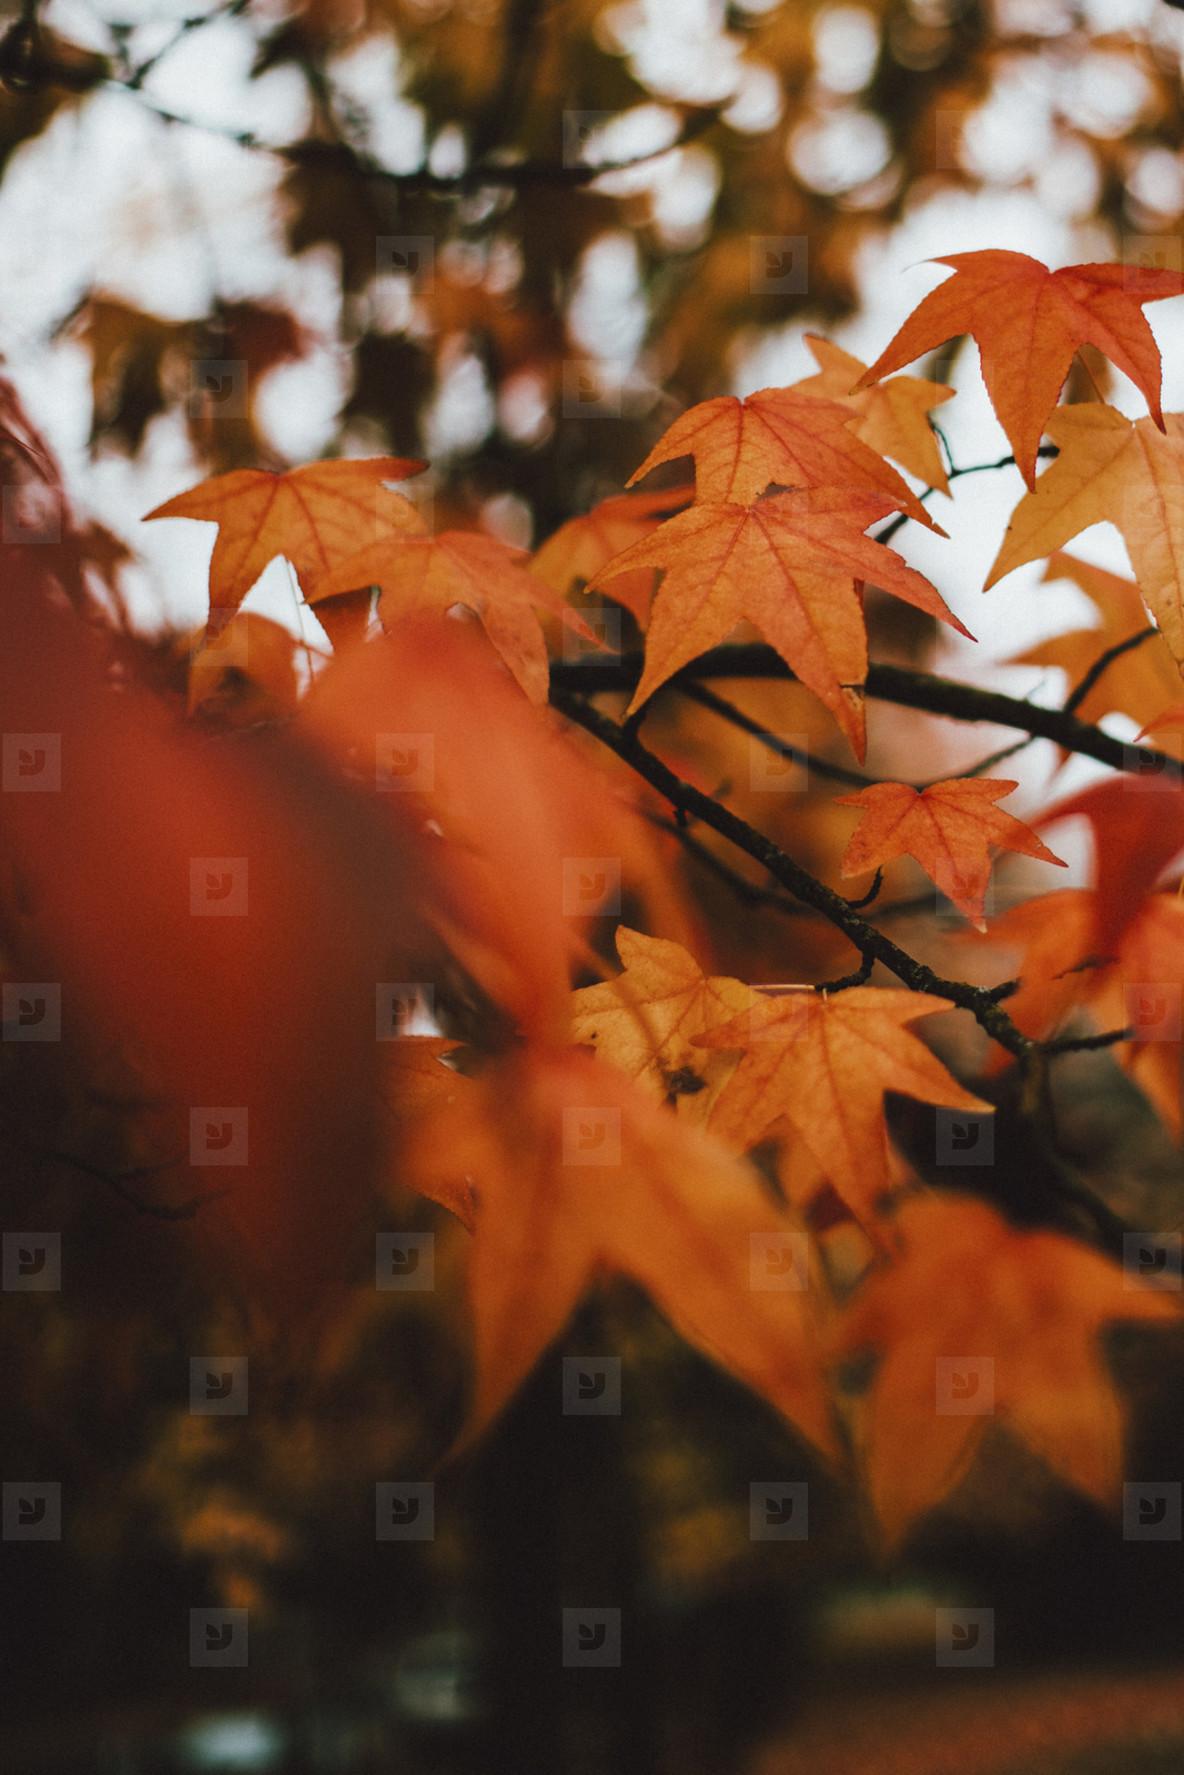 Close up orange autumn leaves on branch